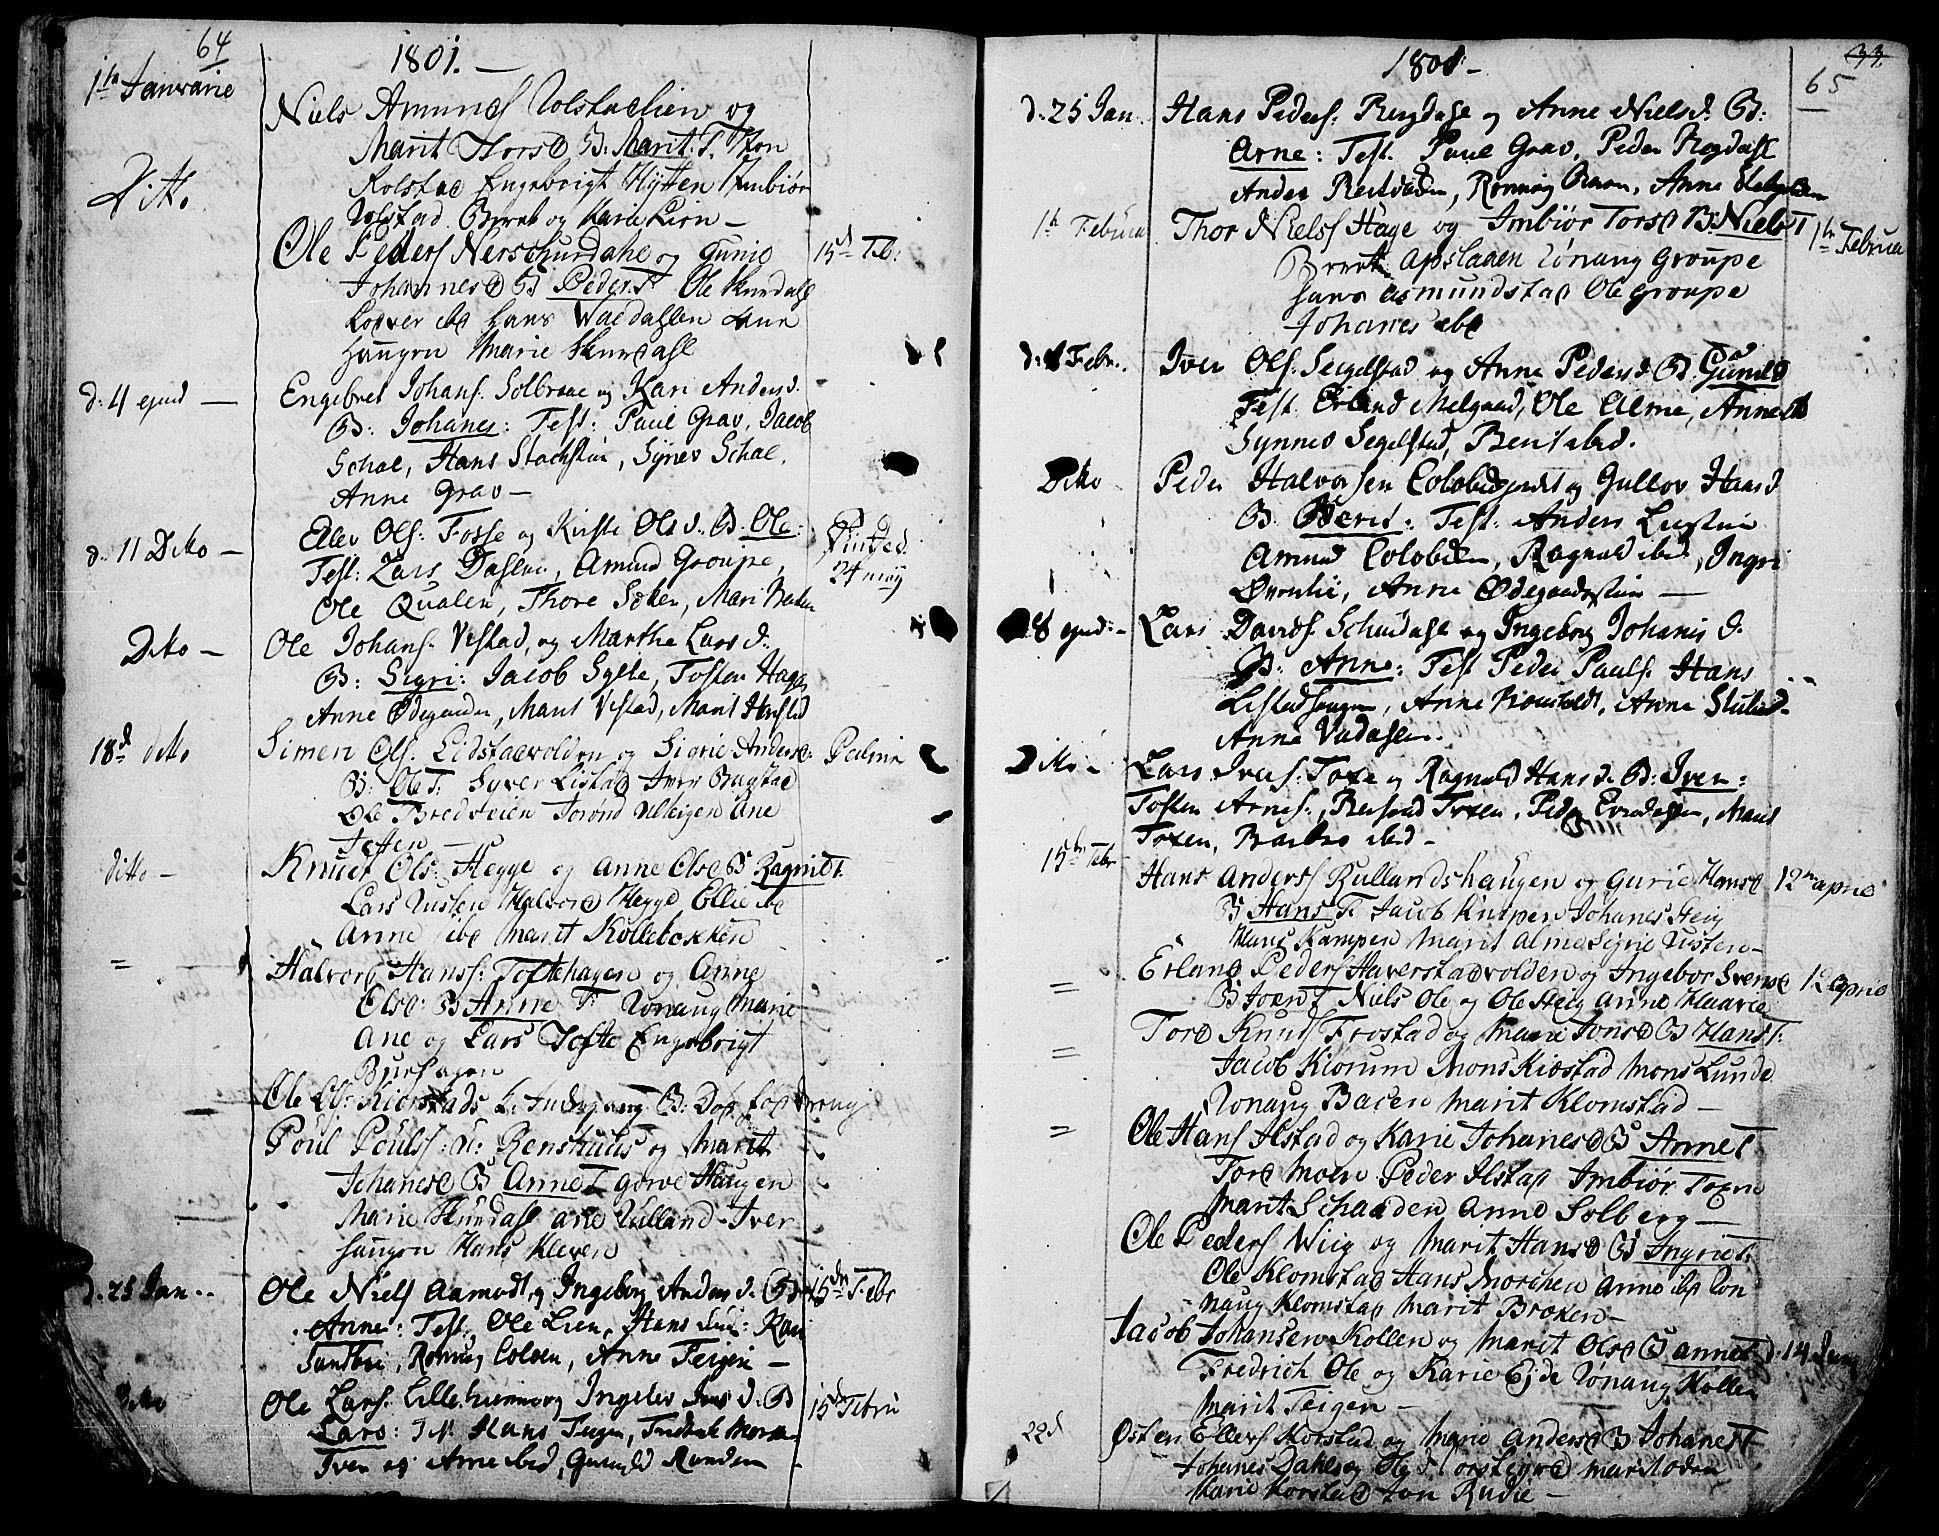 SAH, Fron prestekontor, H/Ha/Haa/L0001: Parish register (official) no. 1, 1799-1816, p. 64-65